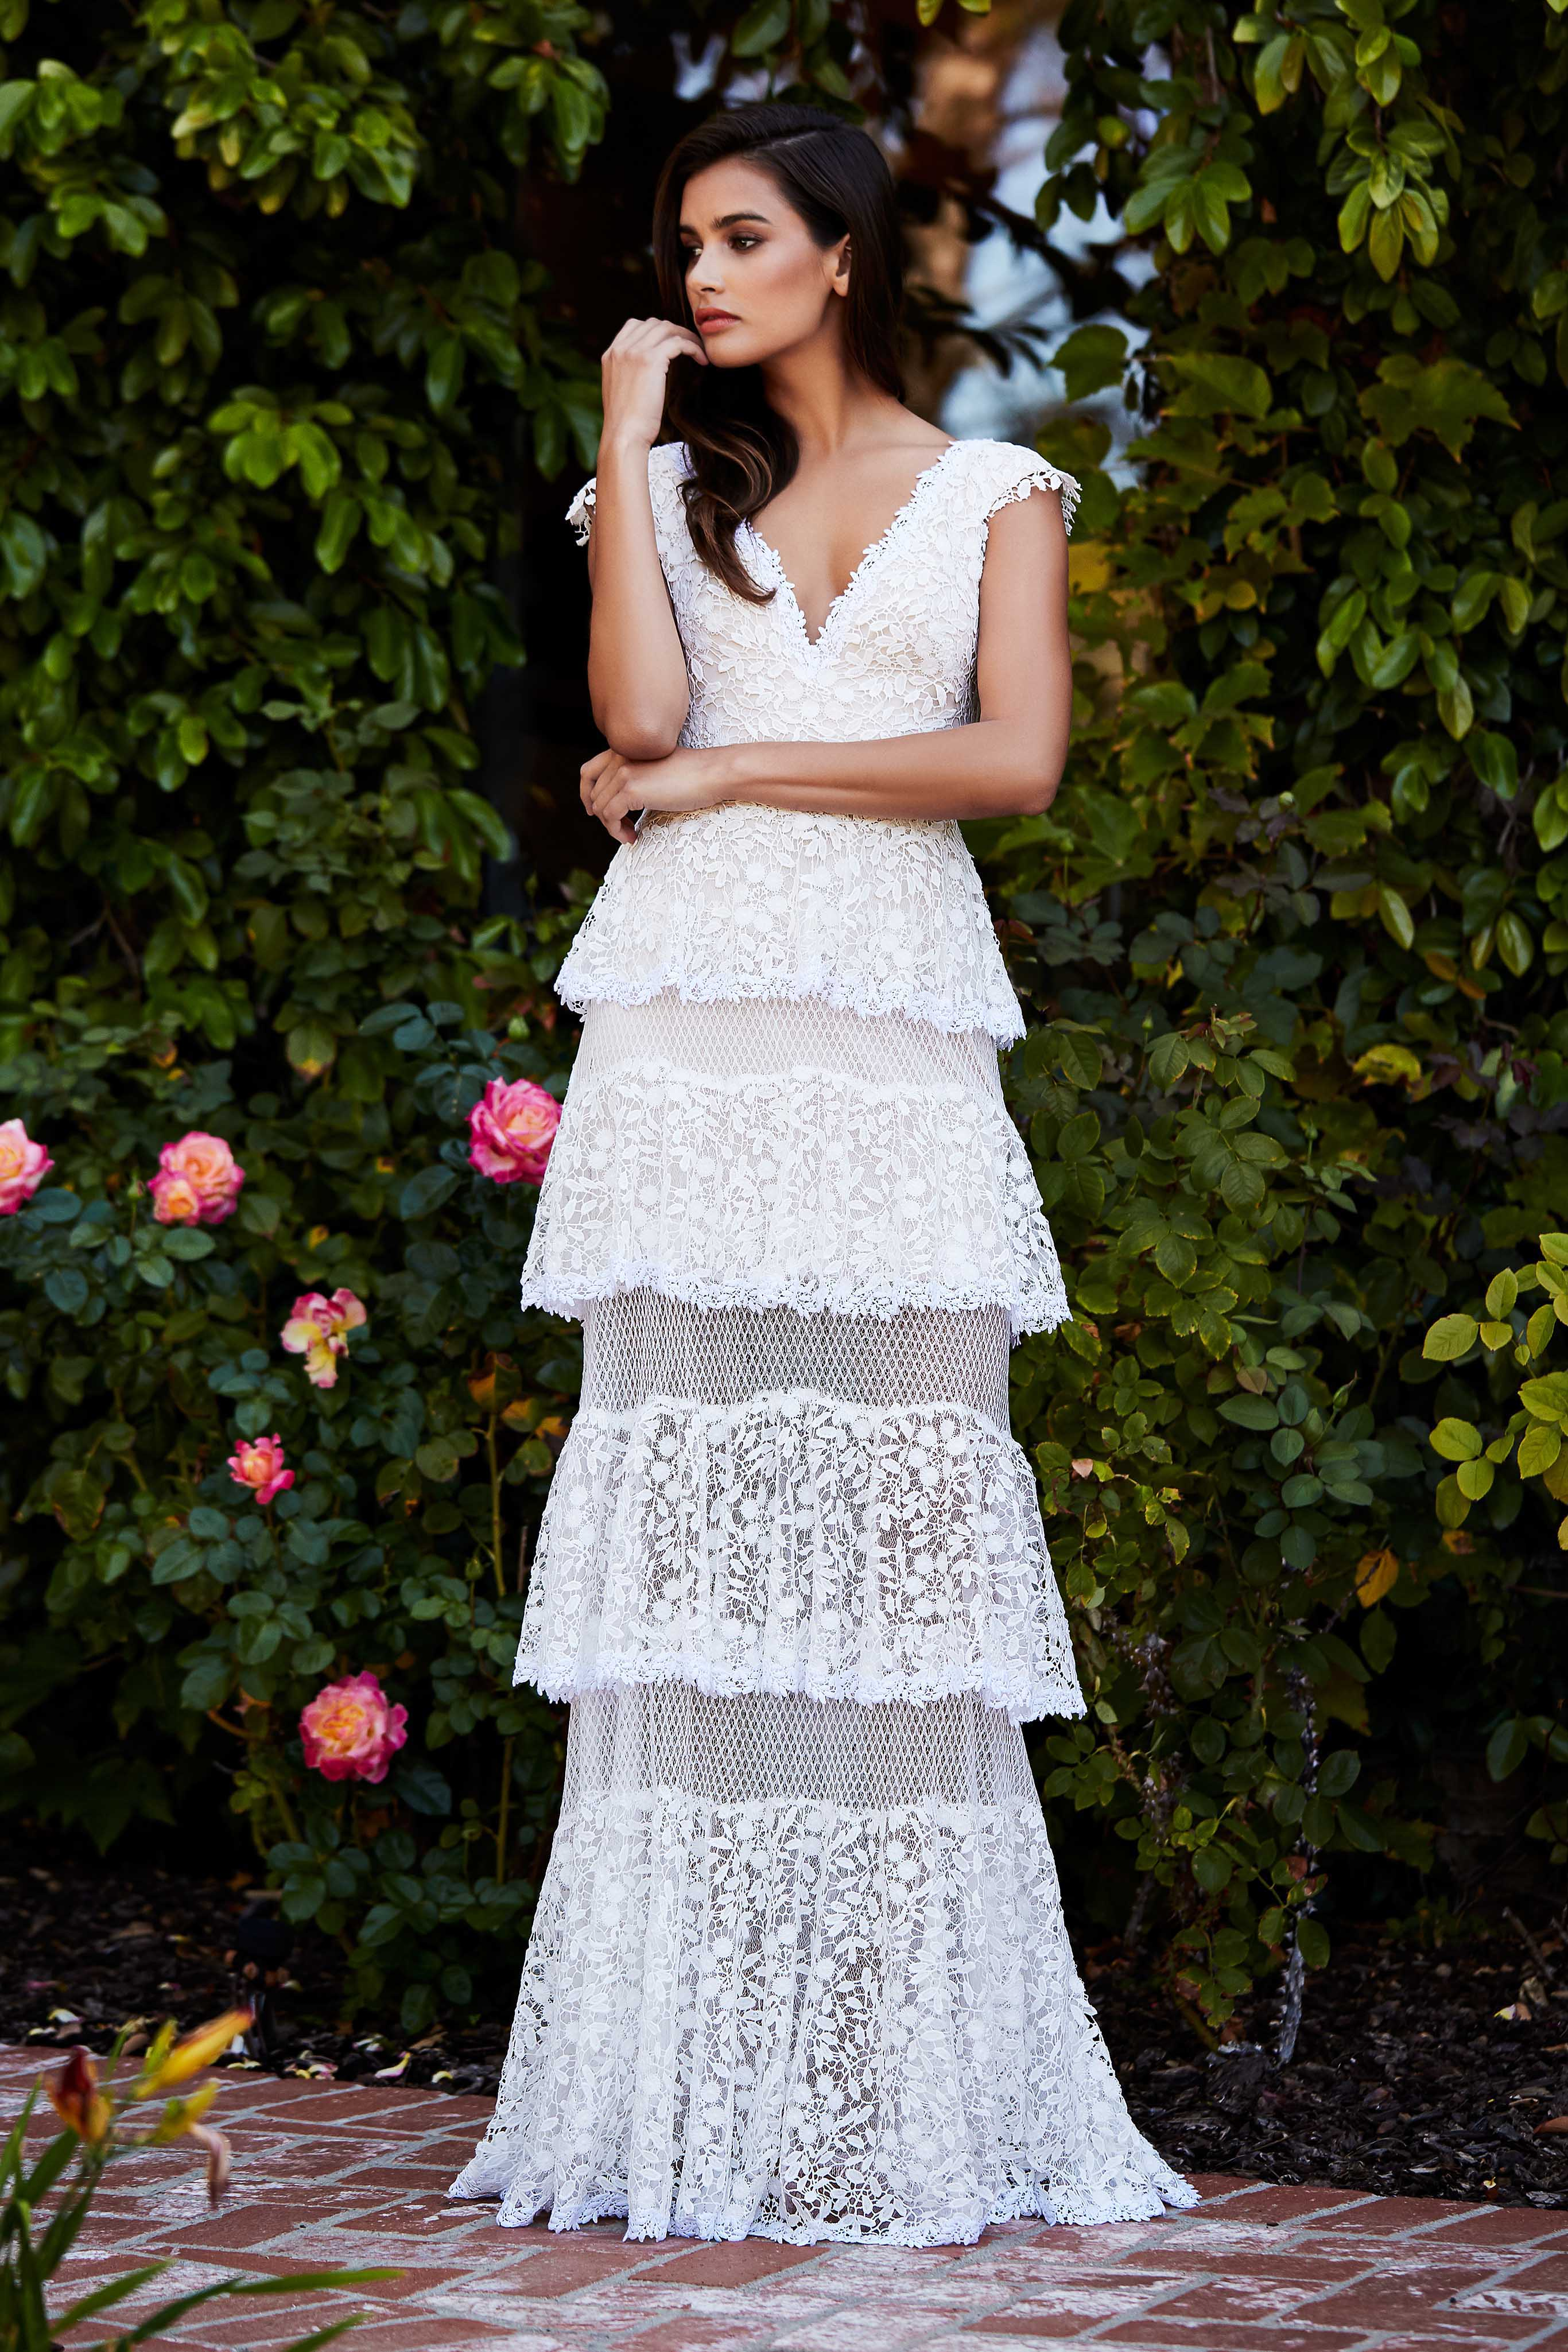 tadashi shoji wedding dress fall 2018 tiered lace v-neck